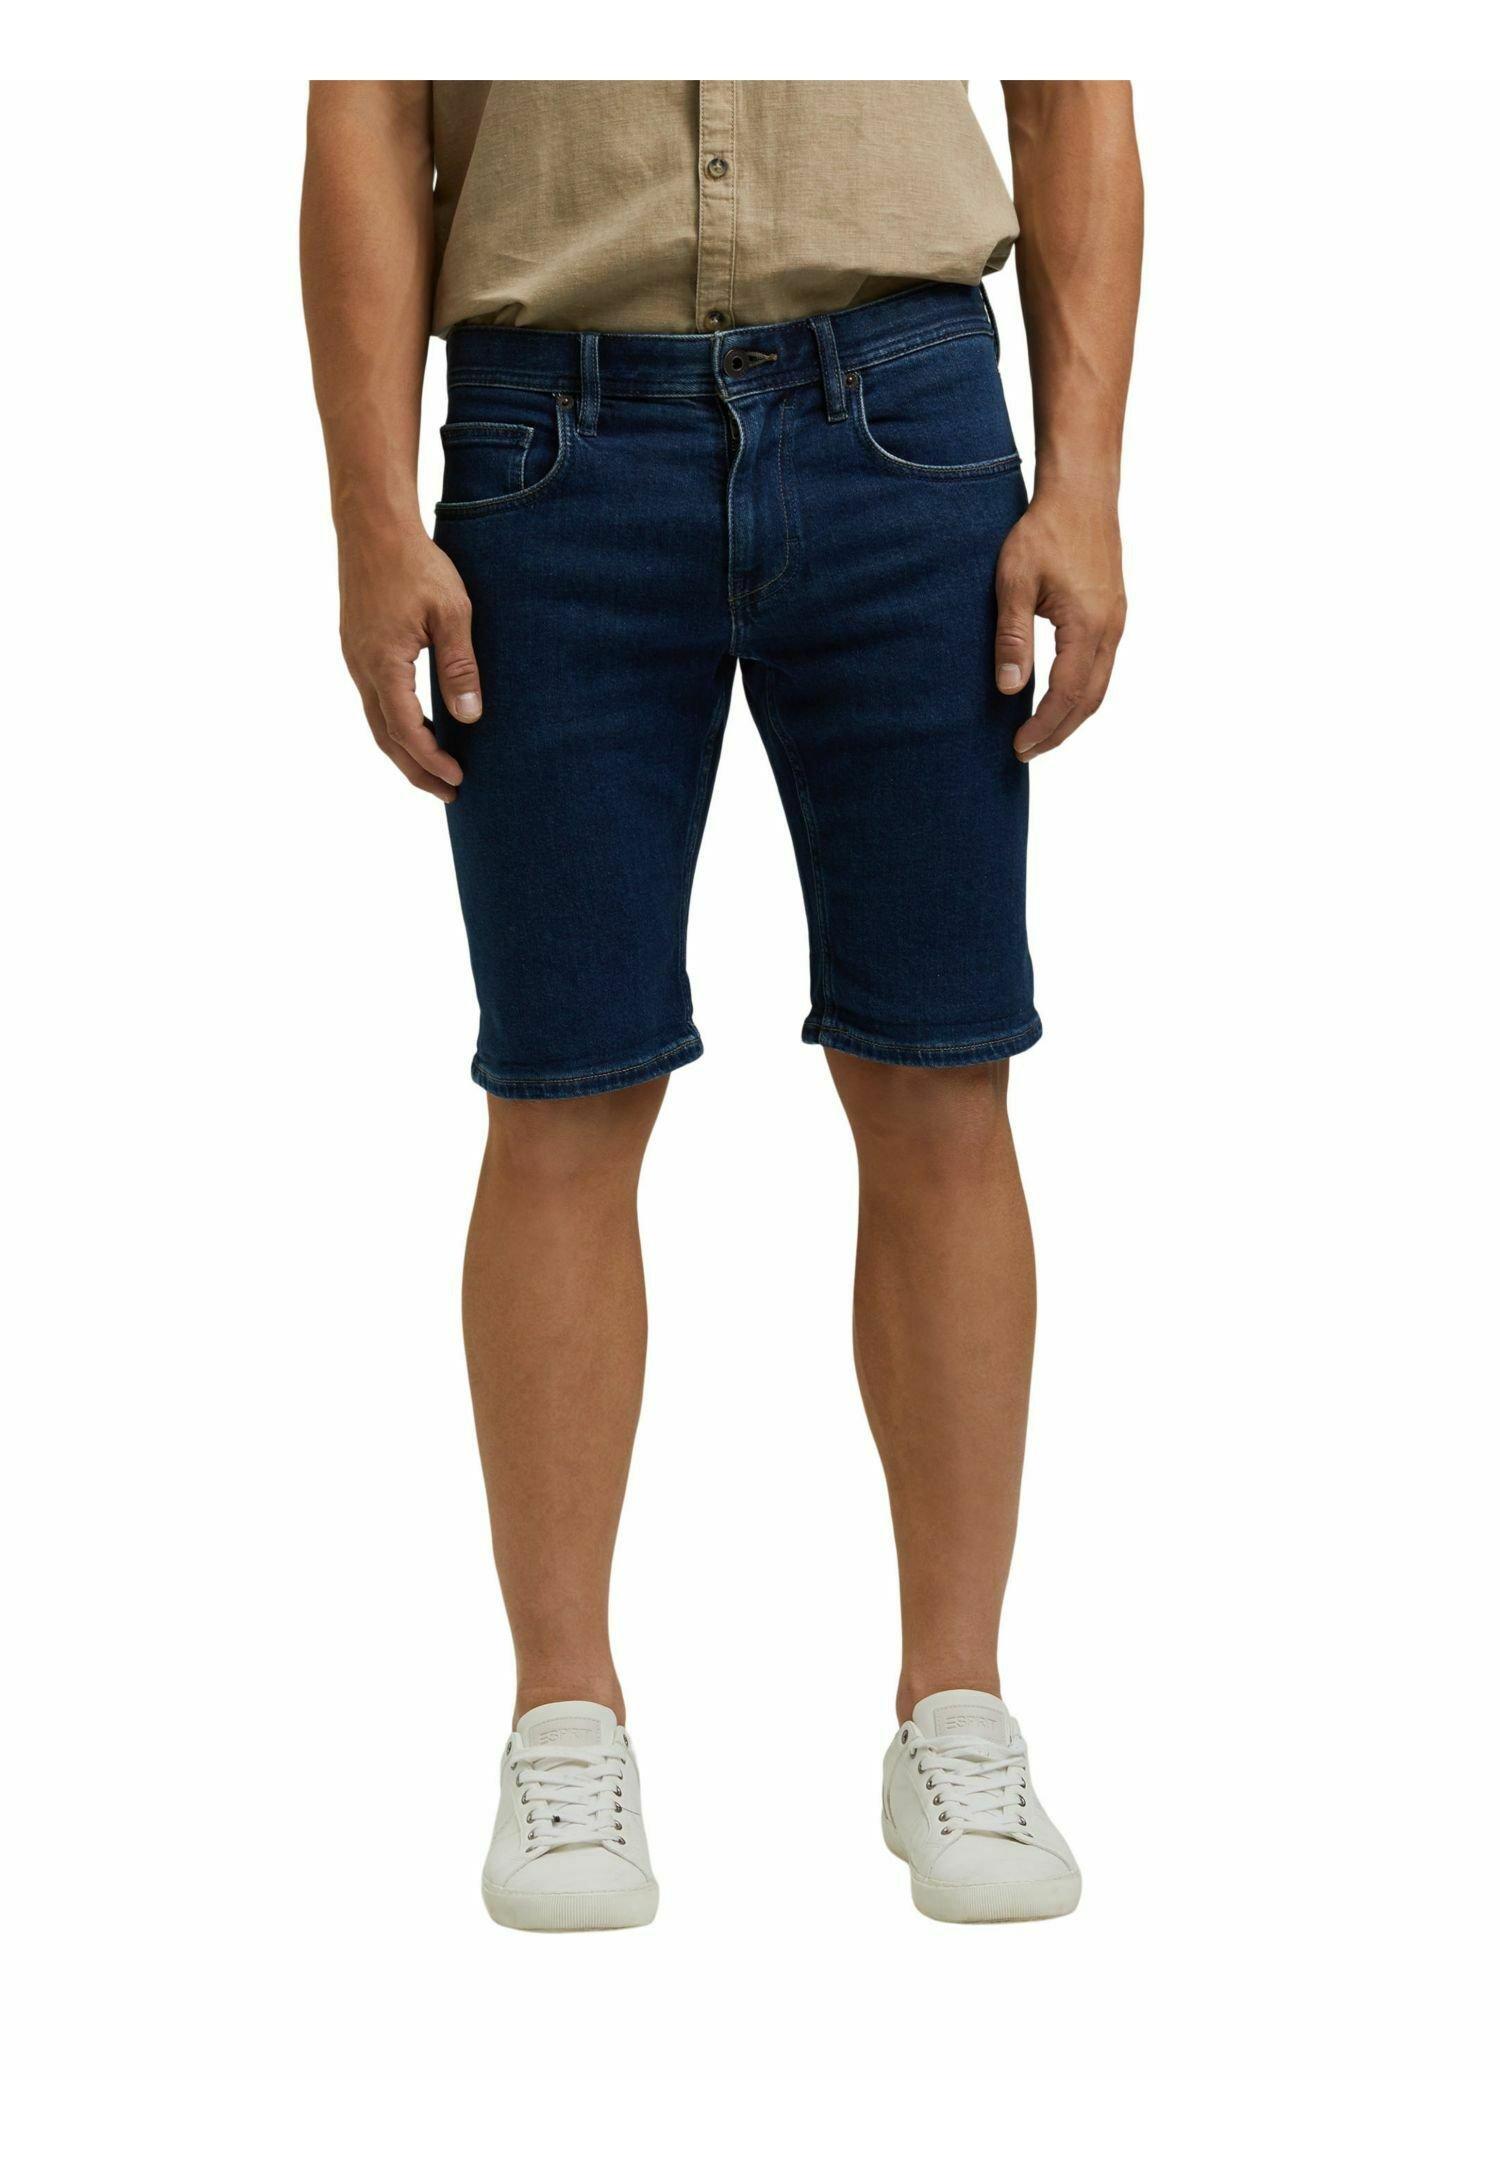 Herrer FASHION - Jeans Short / cowboy shorts